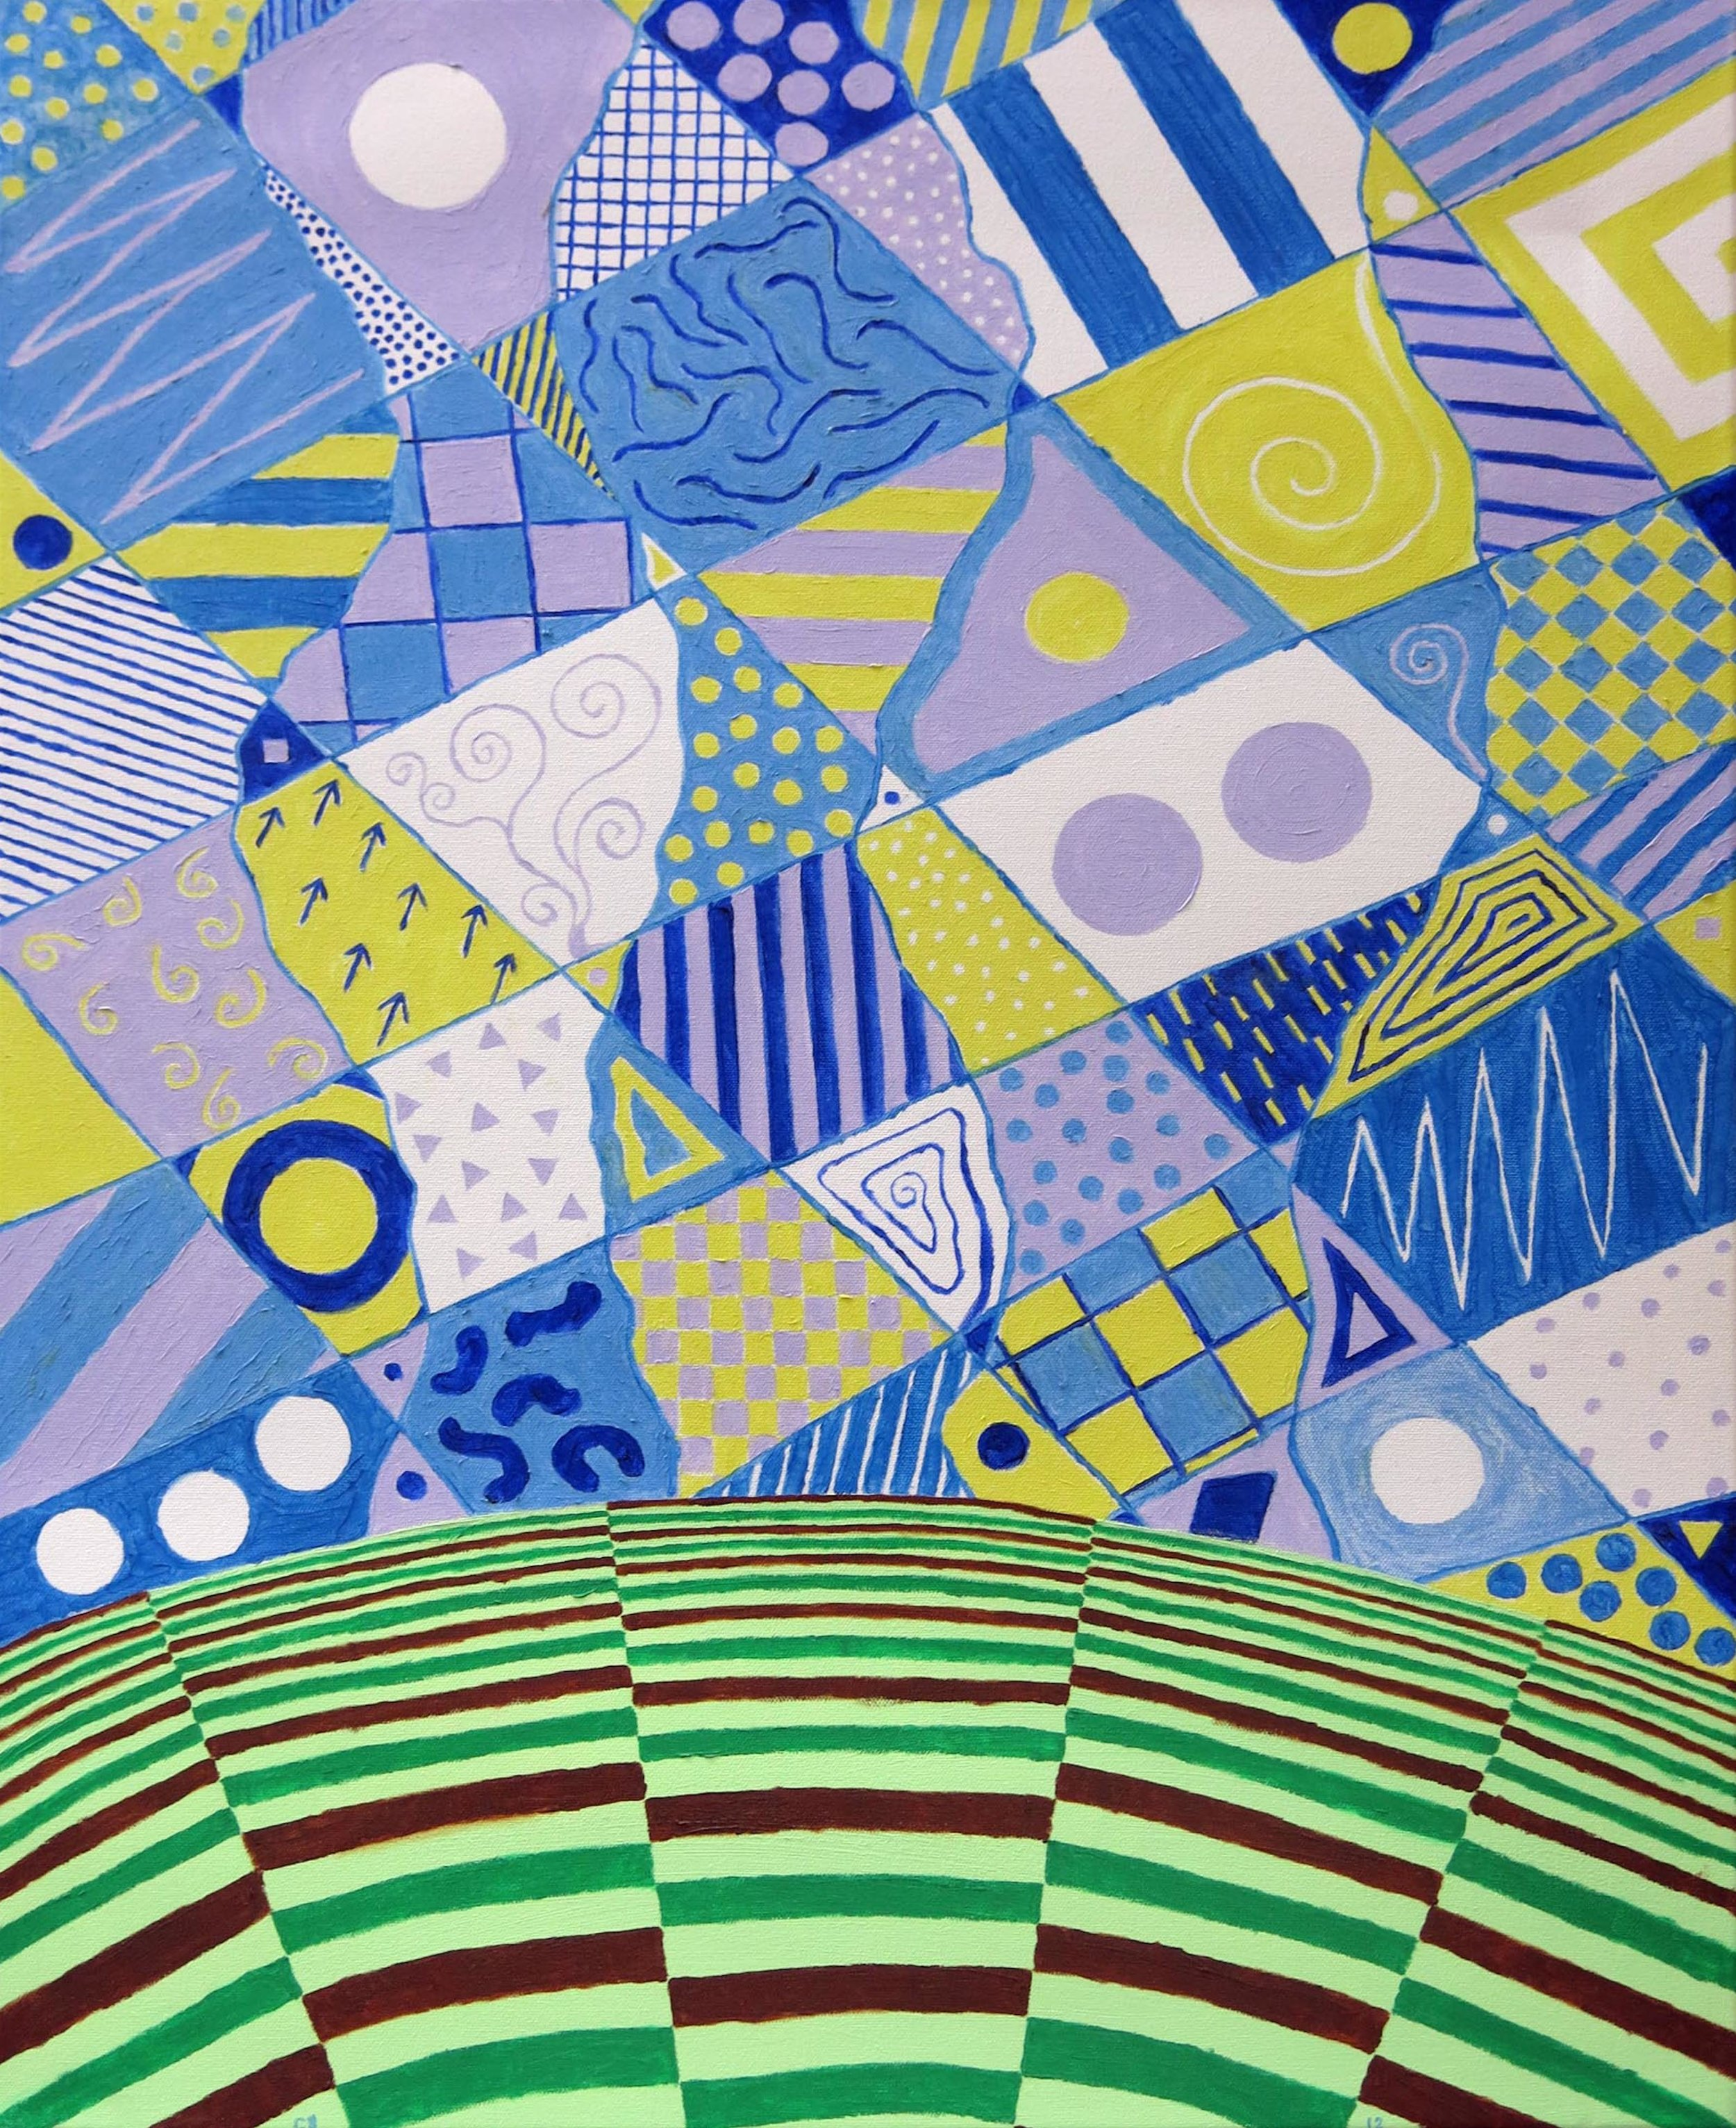 Chuck Boyce, Calico Sky, 2012, oil on canvas, 28h x 21.25w in.